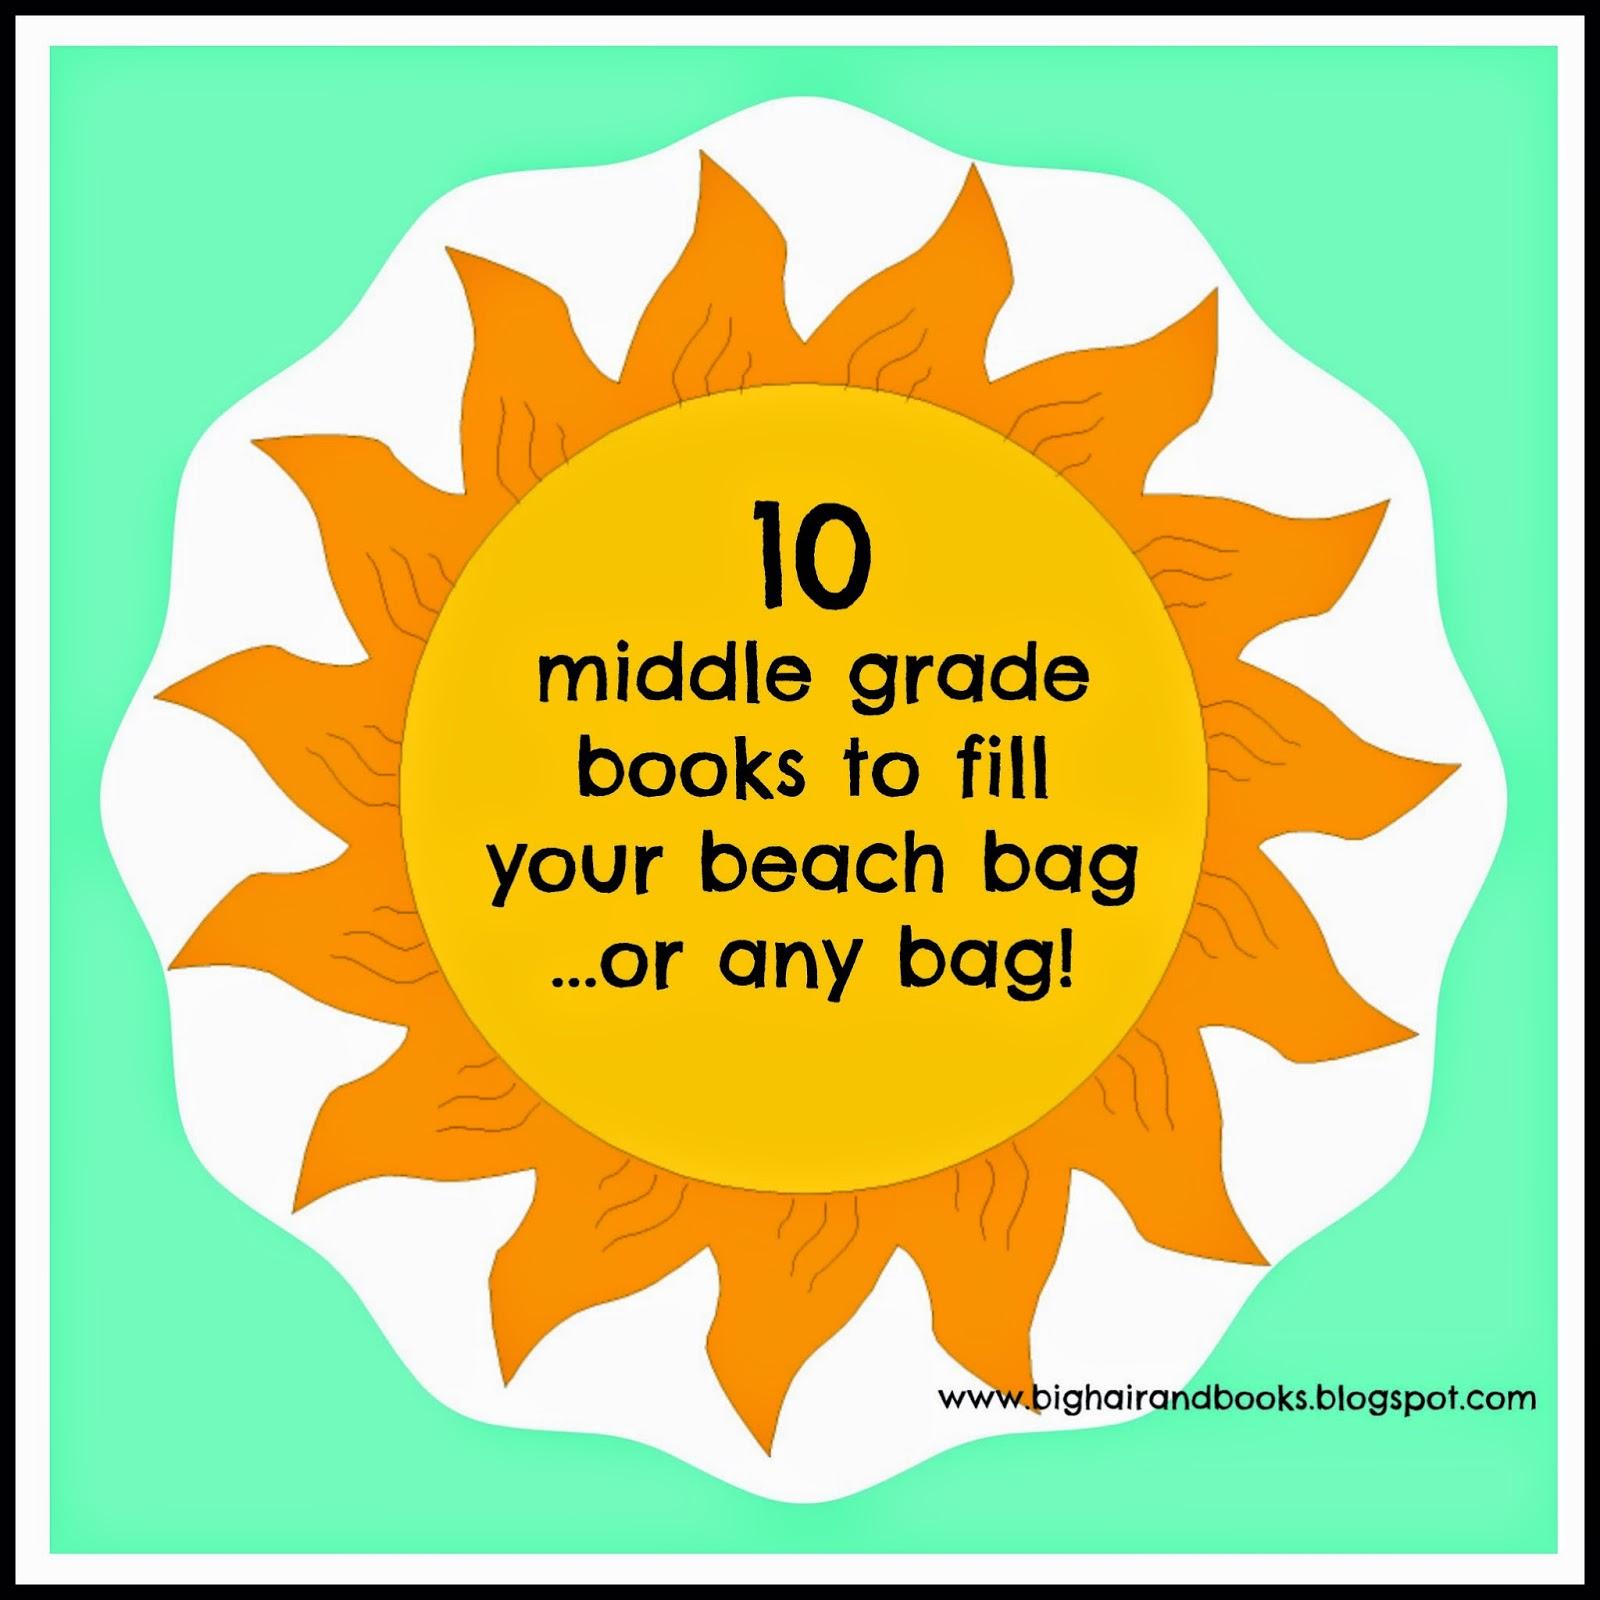 Books for your Beach Bag